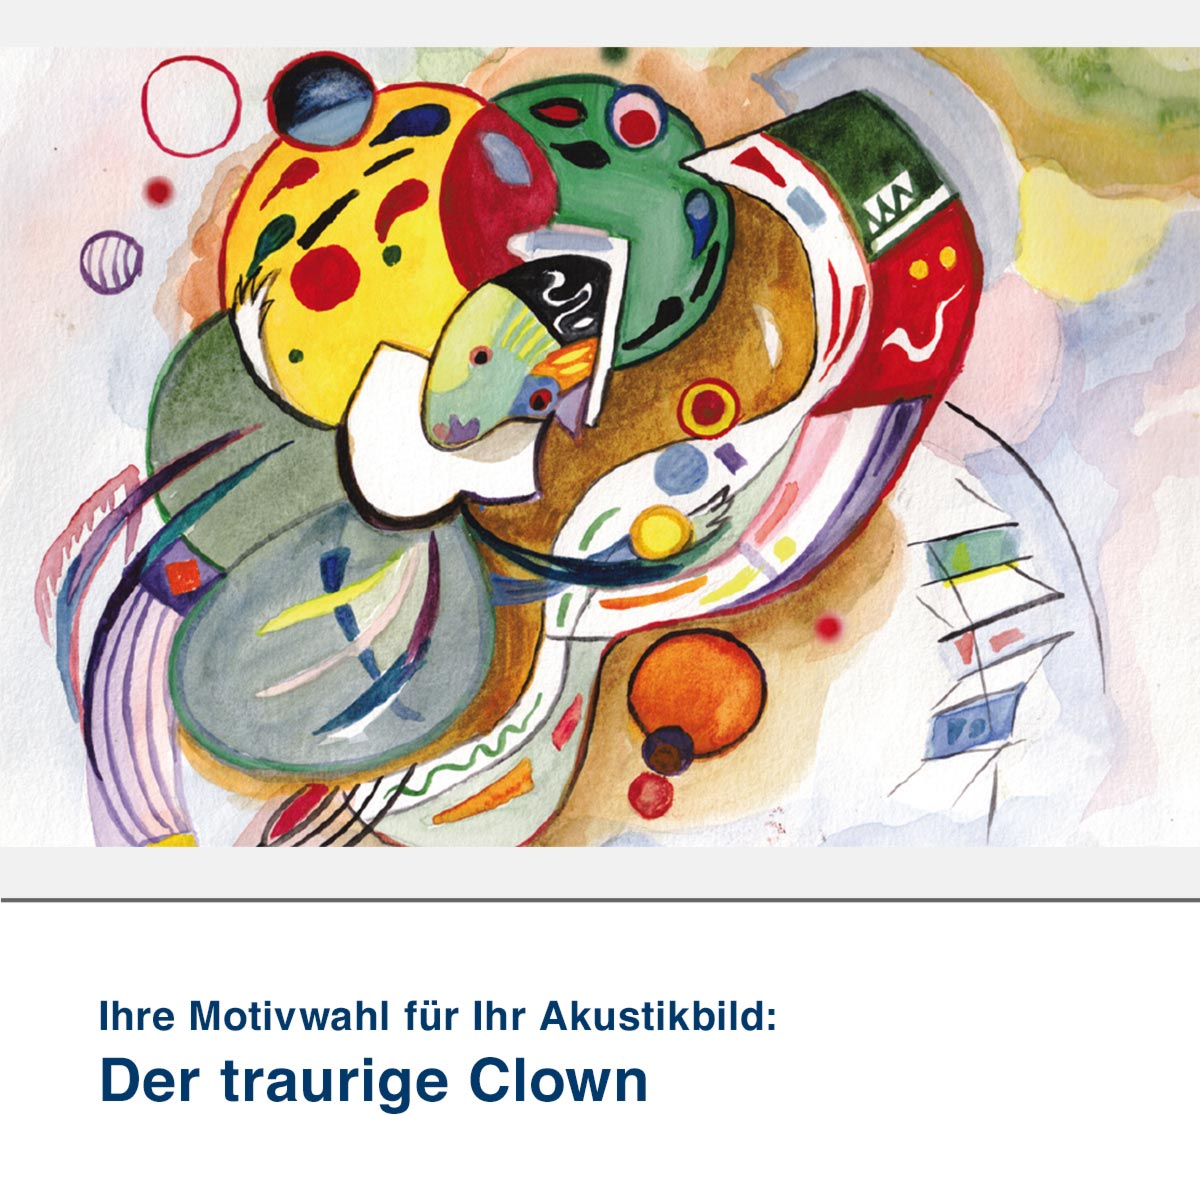 Akustikbild Motiv Der traurige Clown